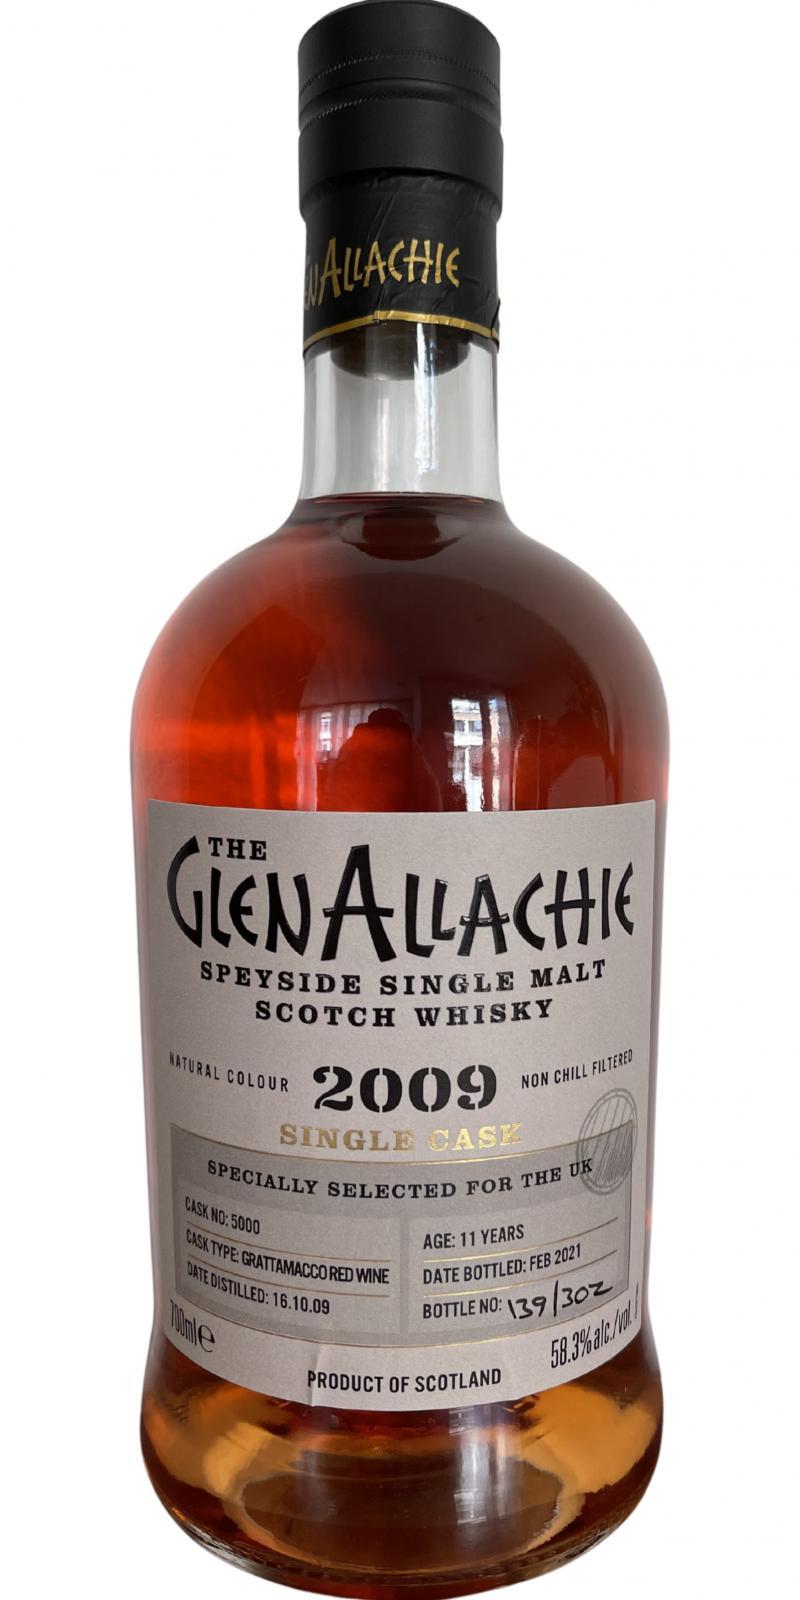 Glenallachie 2009